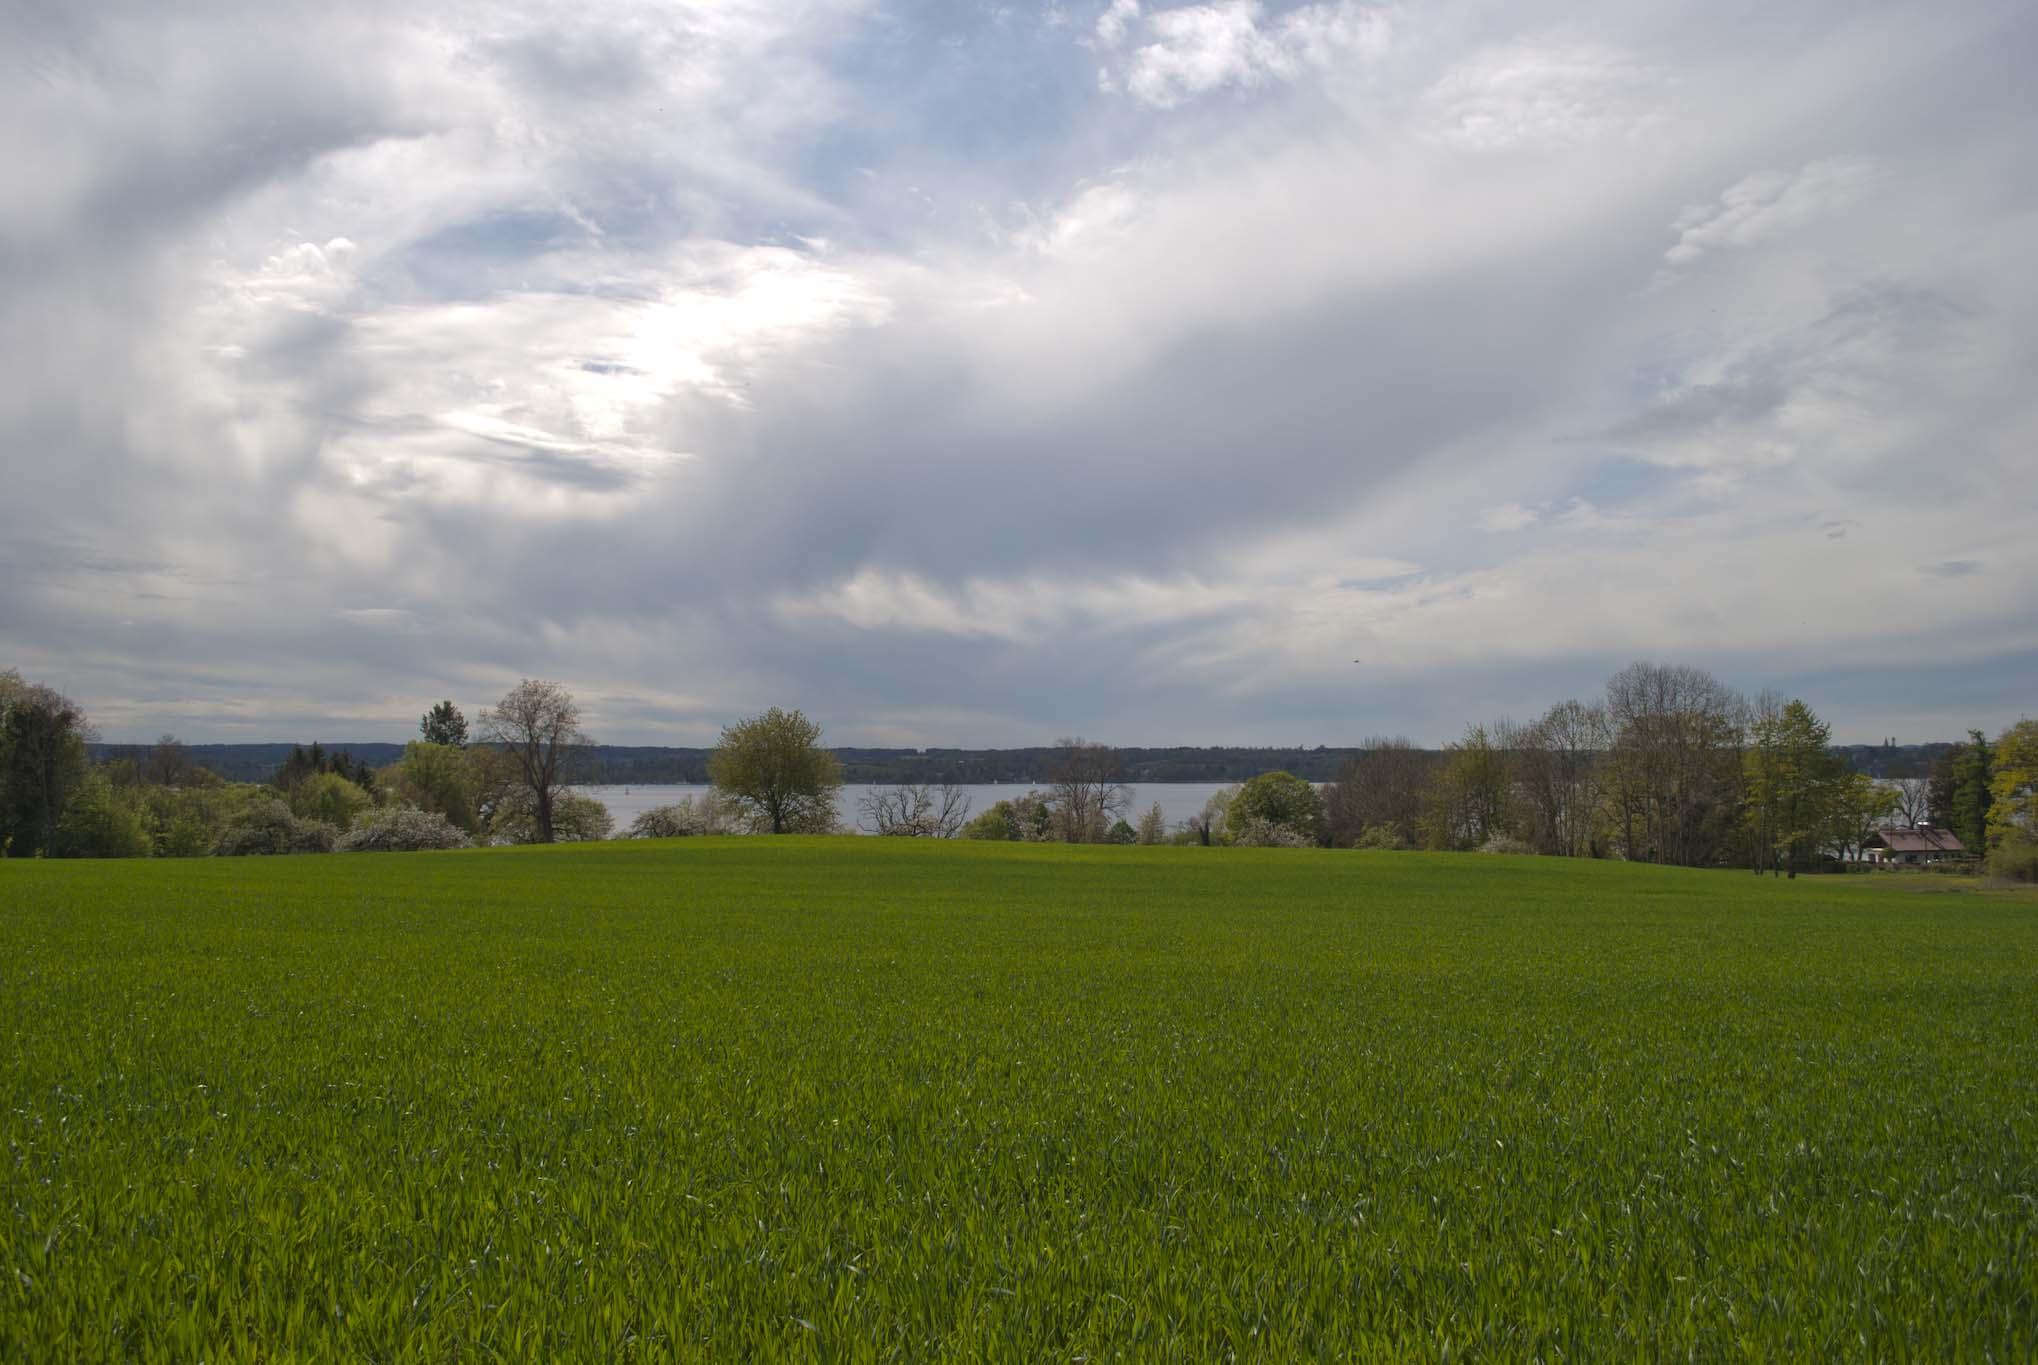 озеро Аммер (Ammersee), Штарнбергер (Starnberger See), Андексское аббатство (Kloster Andechs)